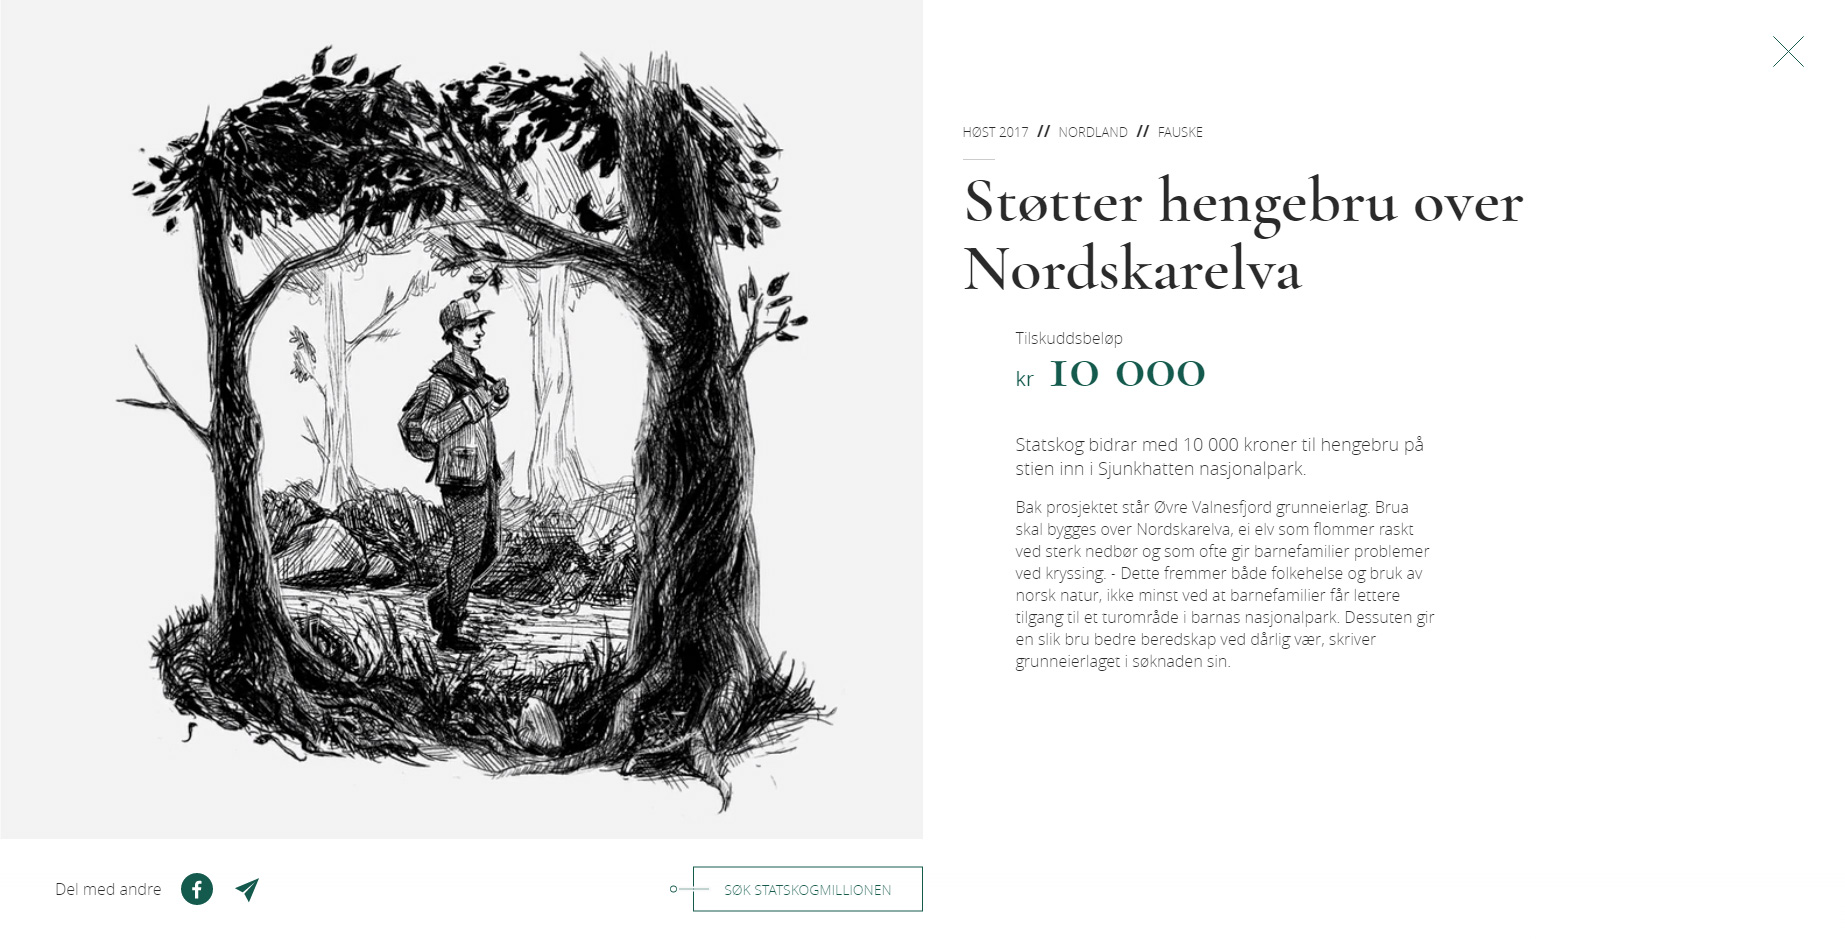 Statskogmillionen - Website of the Day